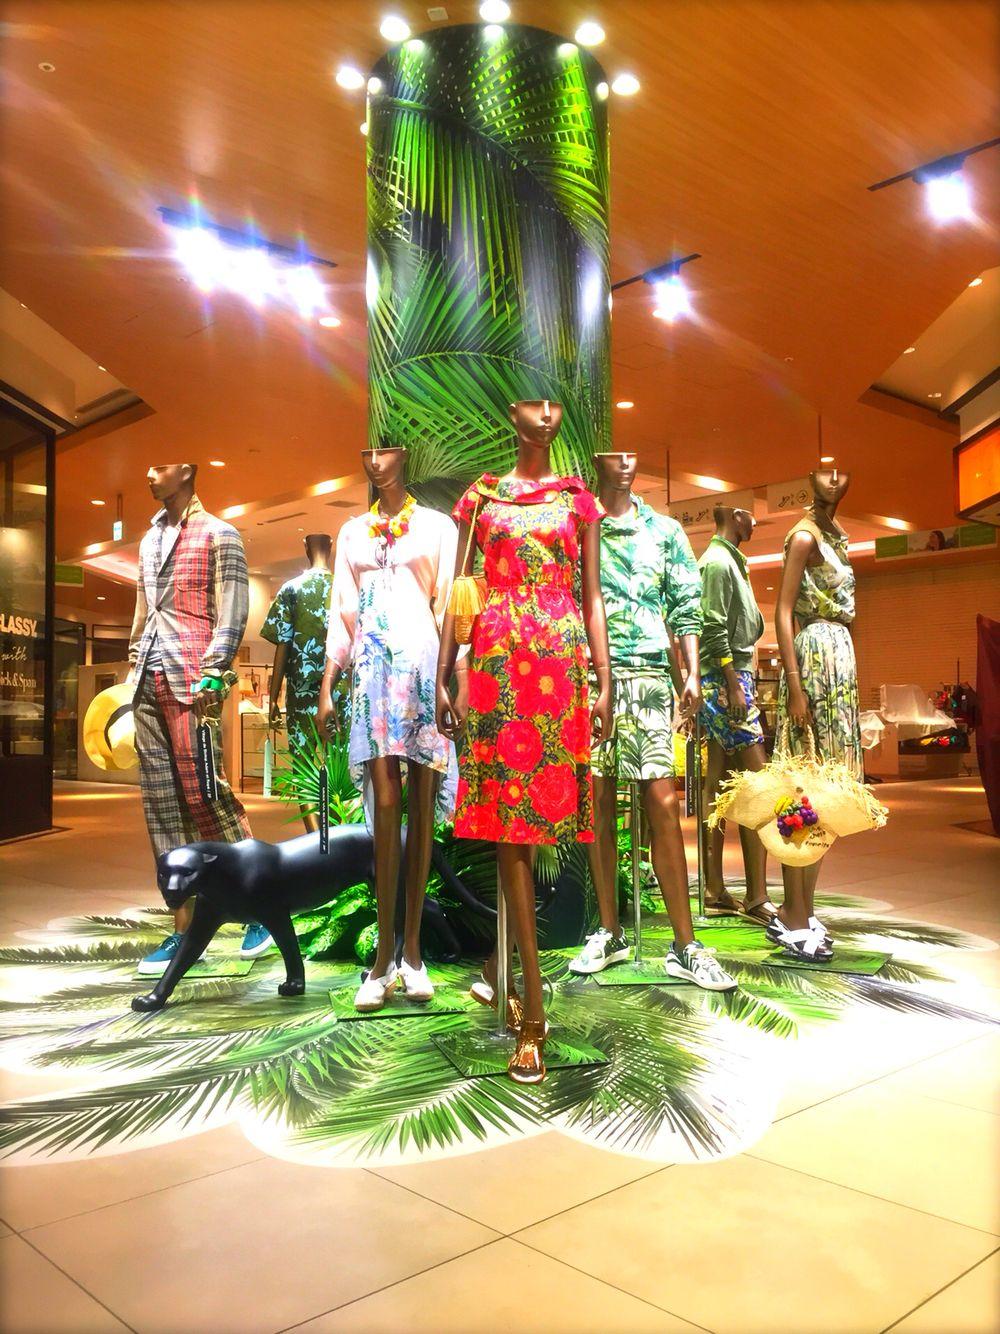 Futakotamagawa rise s.c.  visual presentation 「welcome to the jungle」#summer #shopping #visualpresentation #二子玉川 #futakotamagawa